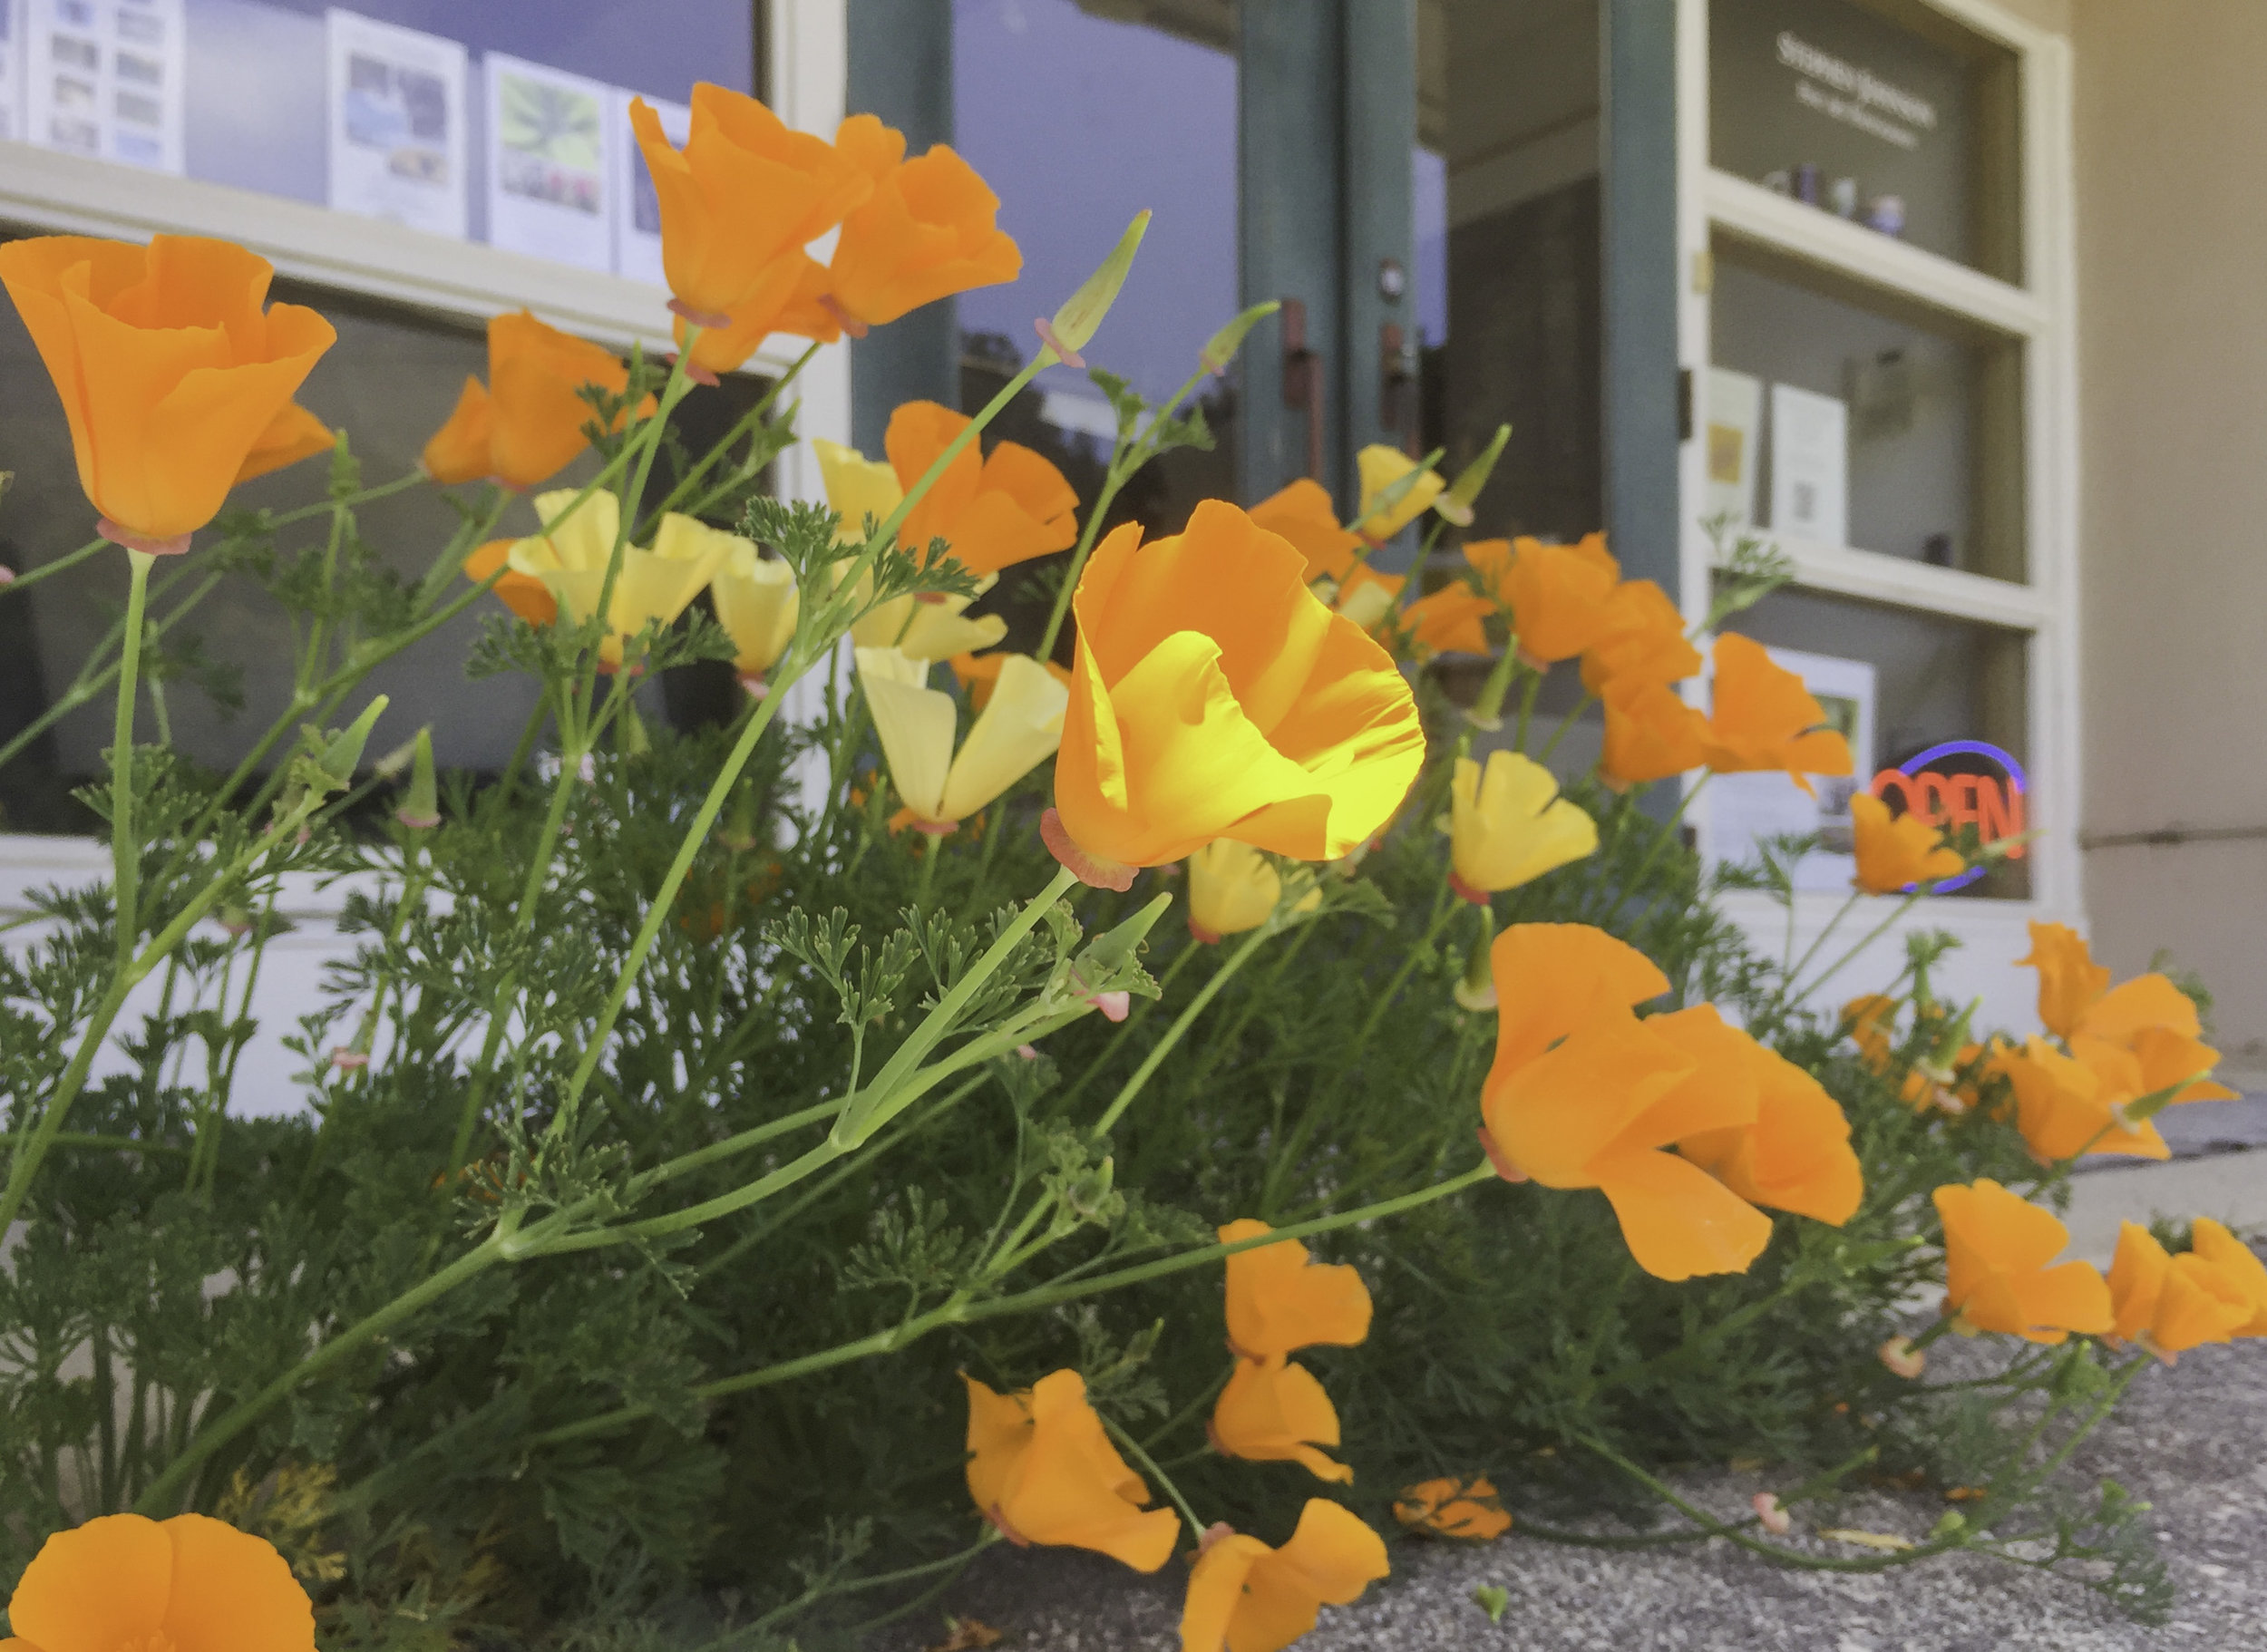 Poppies at Stdio Door. Pacifica, CA. 2019. Canon EOS 5DSr.